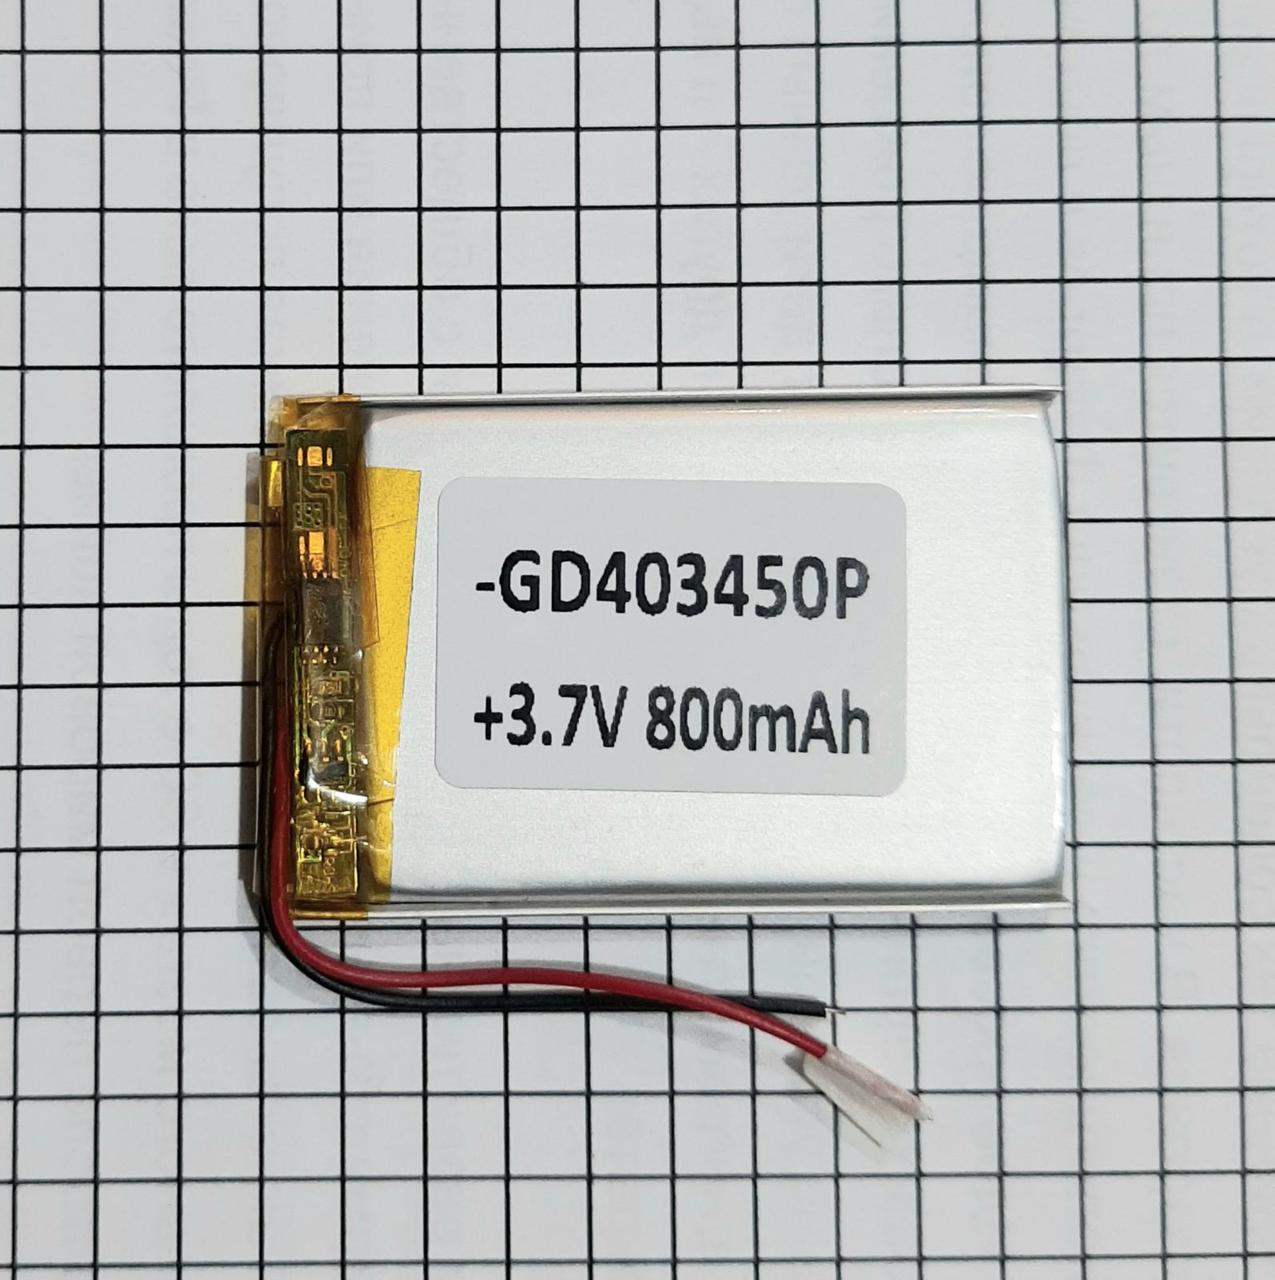 Литий полимерный аккумулятор 043450 800mah